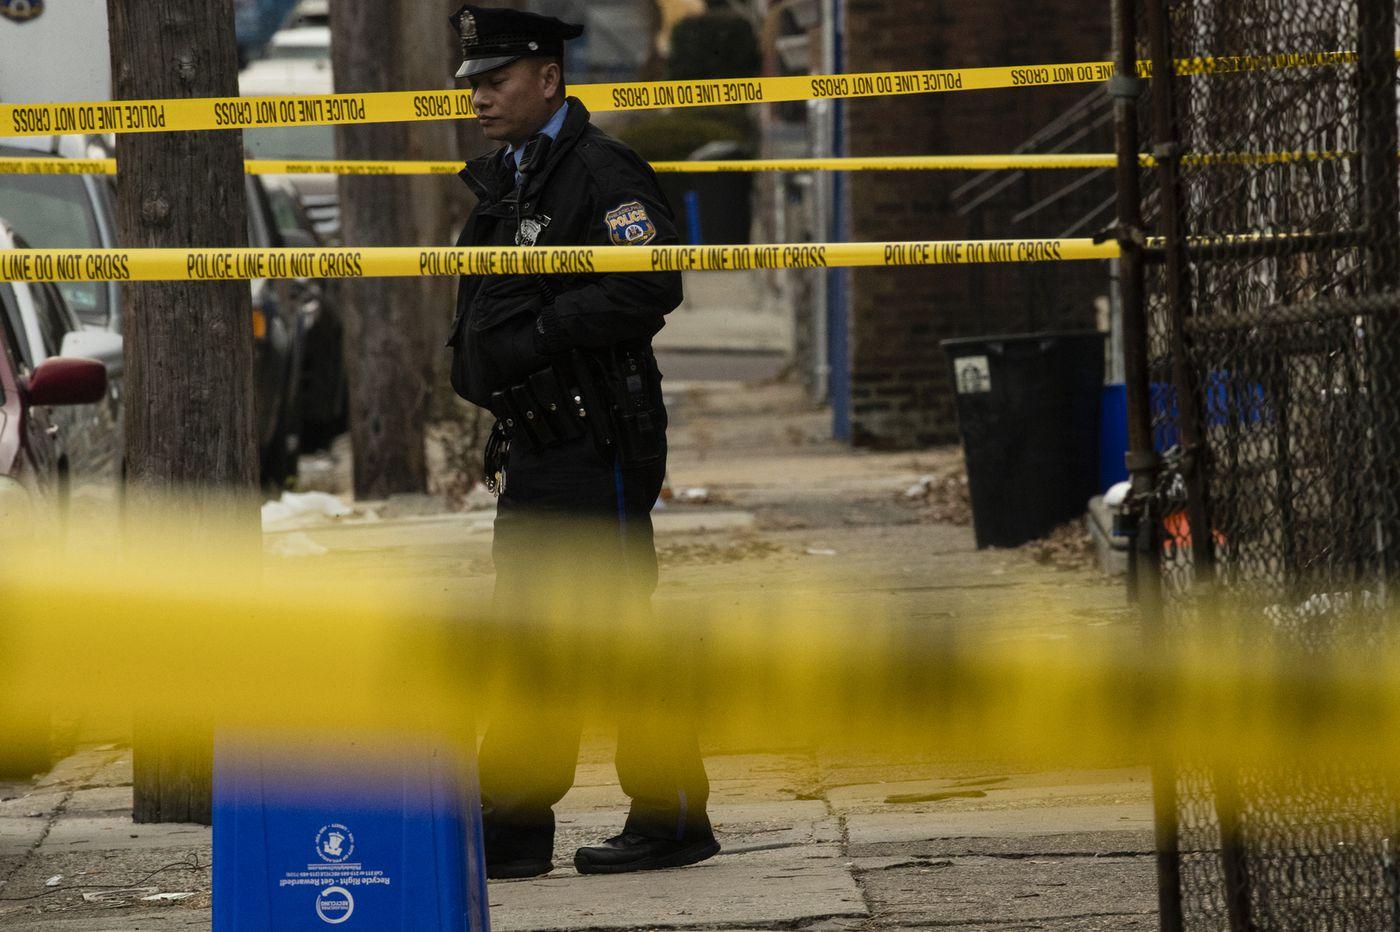 New ideas needed to attack Philadelphia's relentless gun violence | Editorial